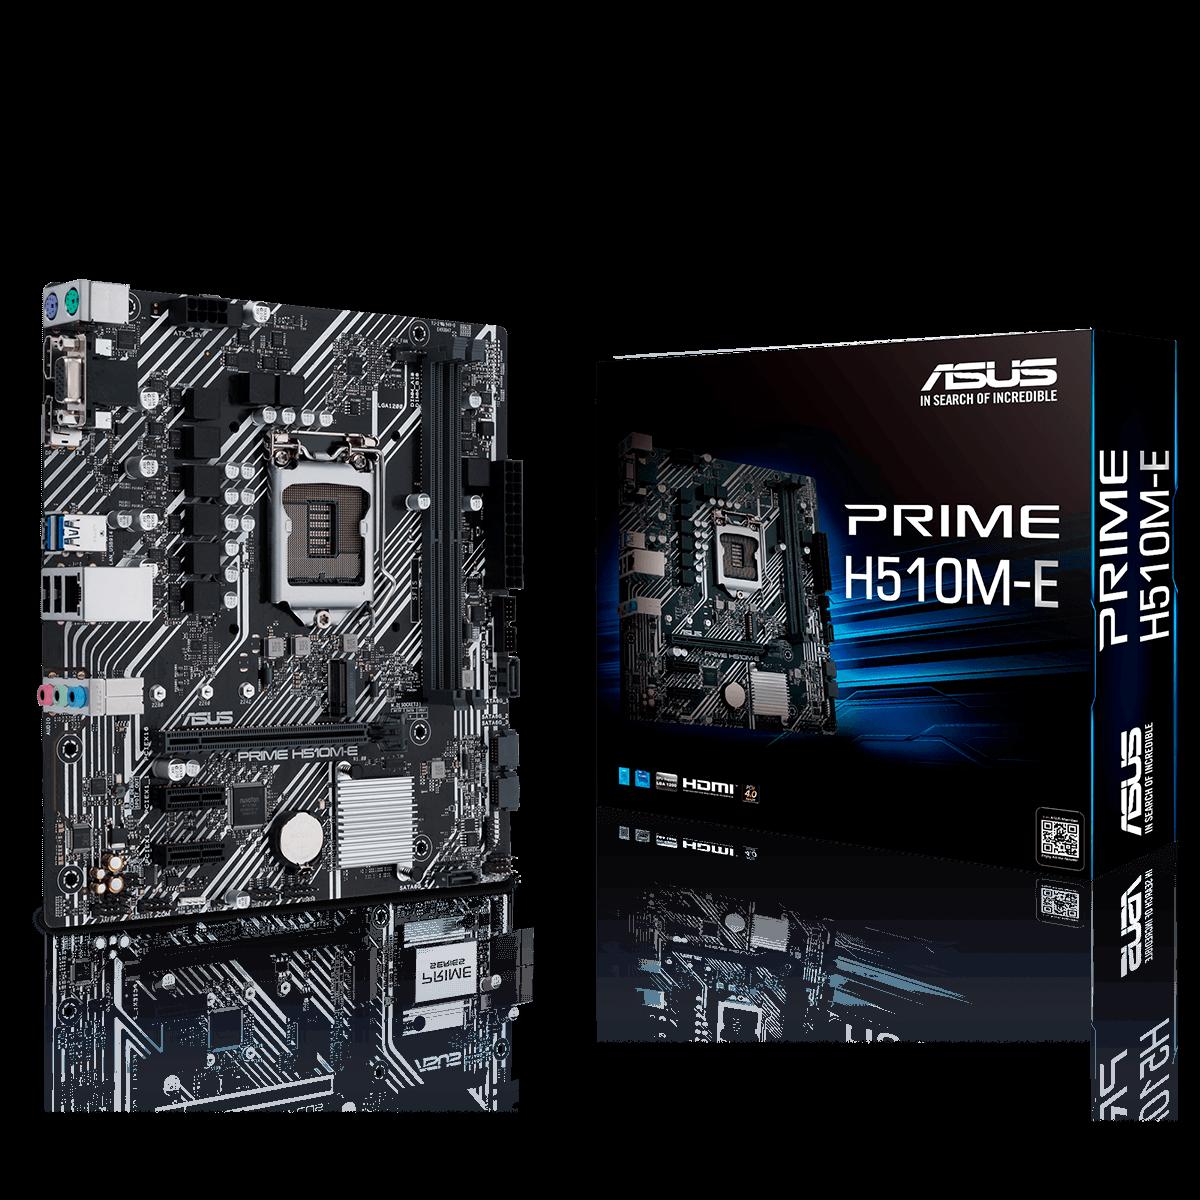 PLACA MAE ASUS PRIME H510M-E DDR4 LGA1200 INTEL H510, PRIME H510M-E